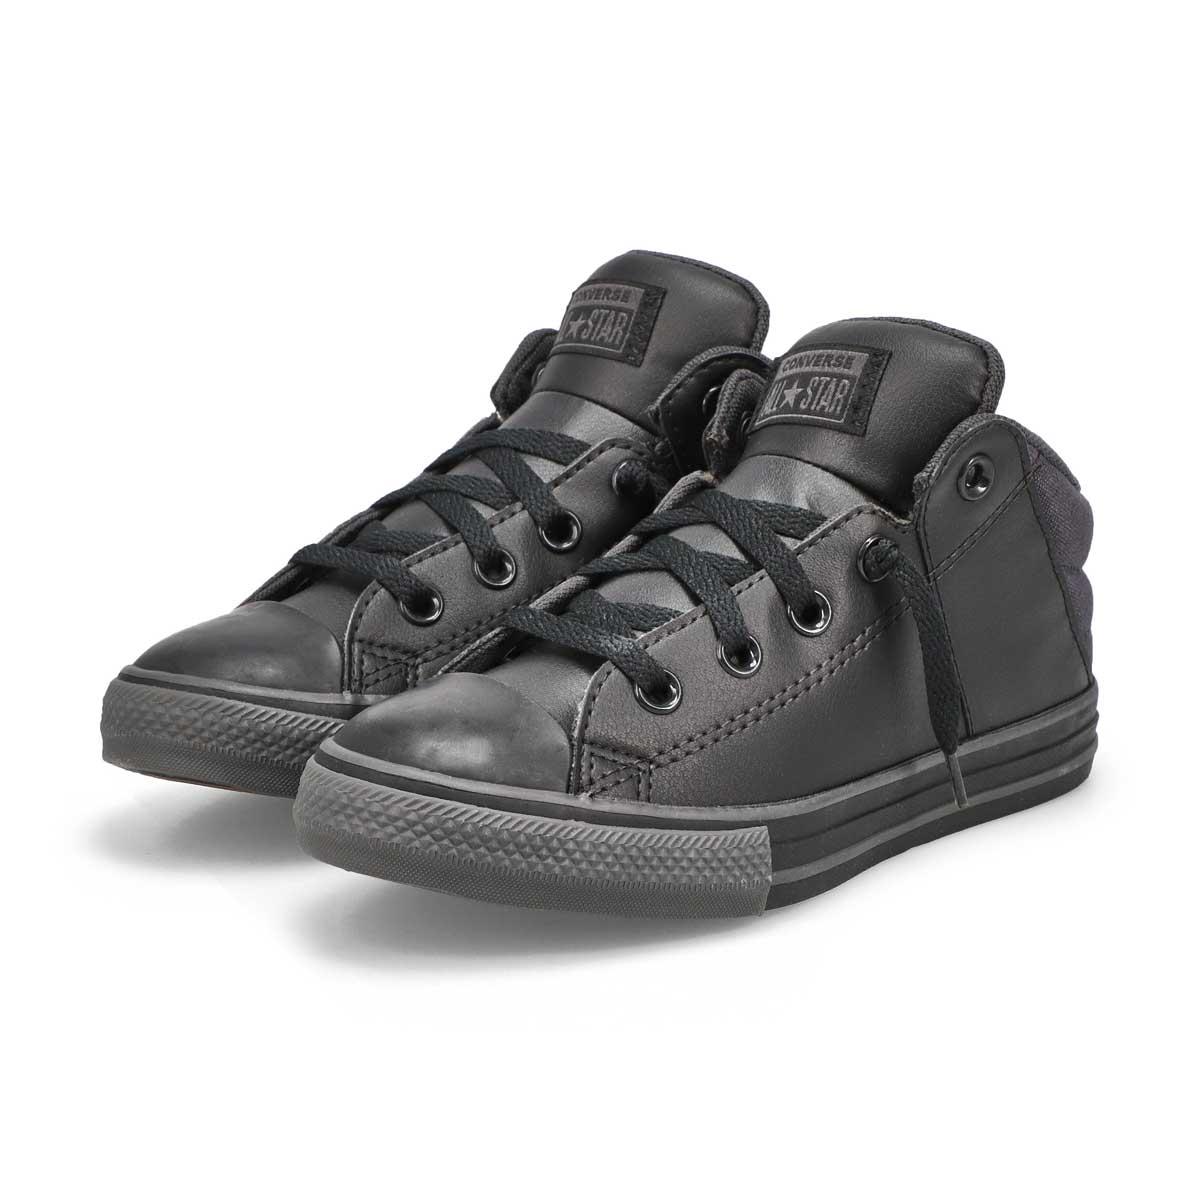 Boys' Chuck Taylor All Star Axel Sneaker- blk/blk